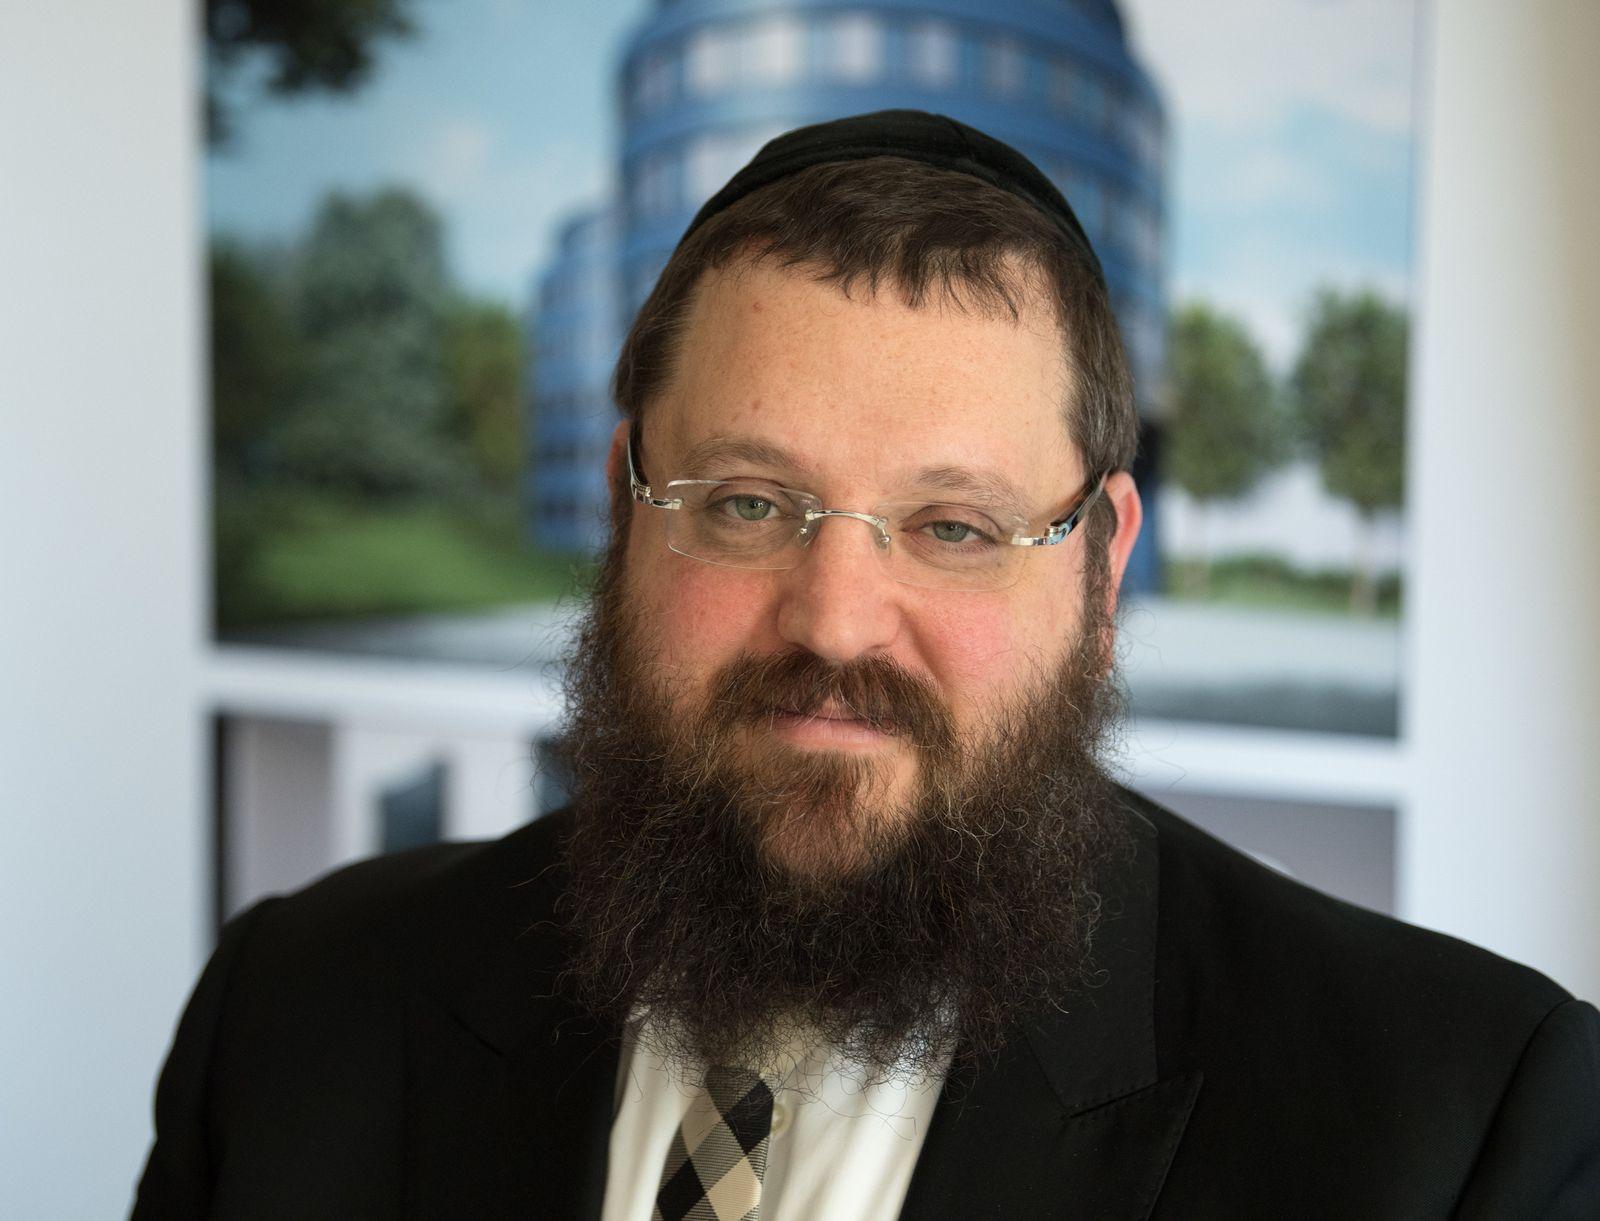 Rabbiner Yehuda Teichtal